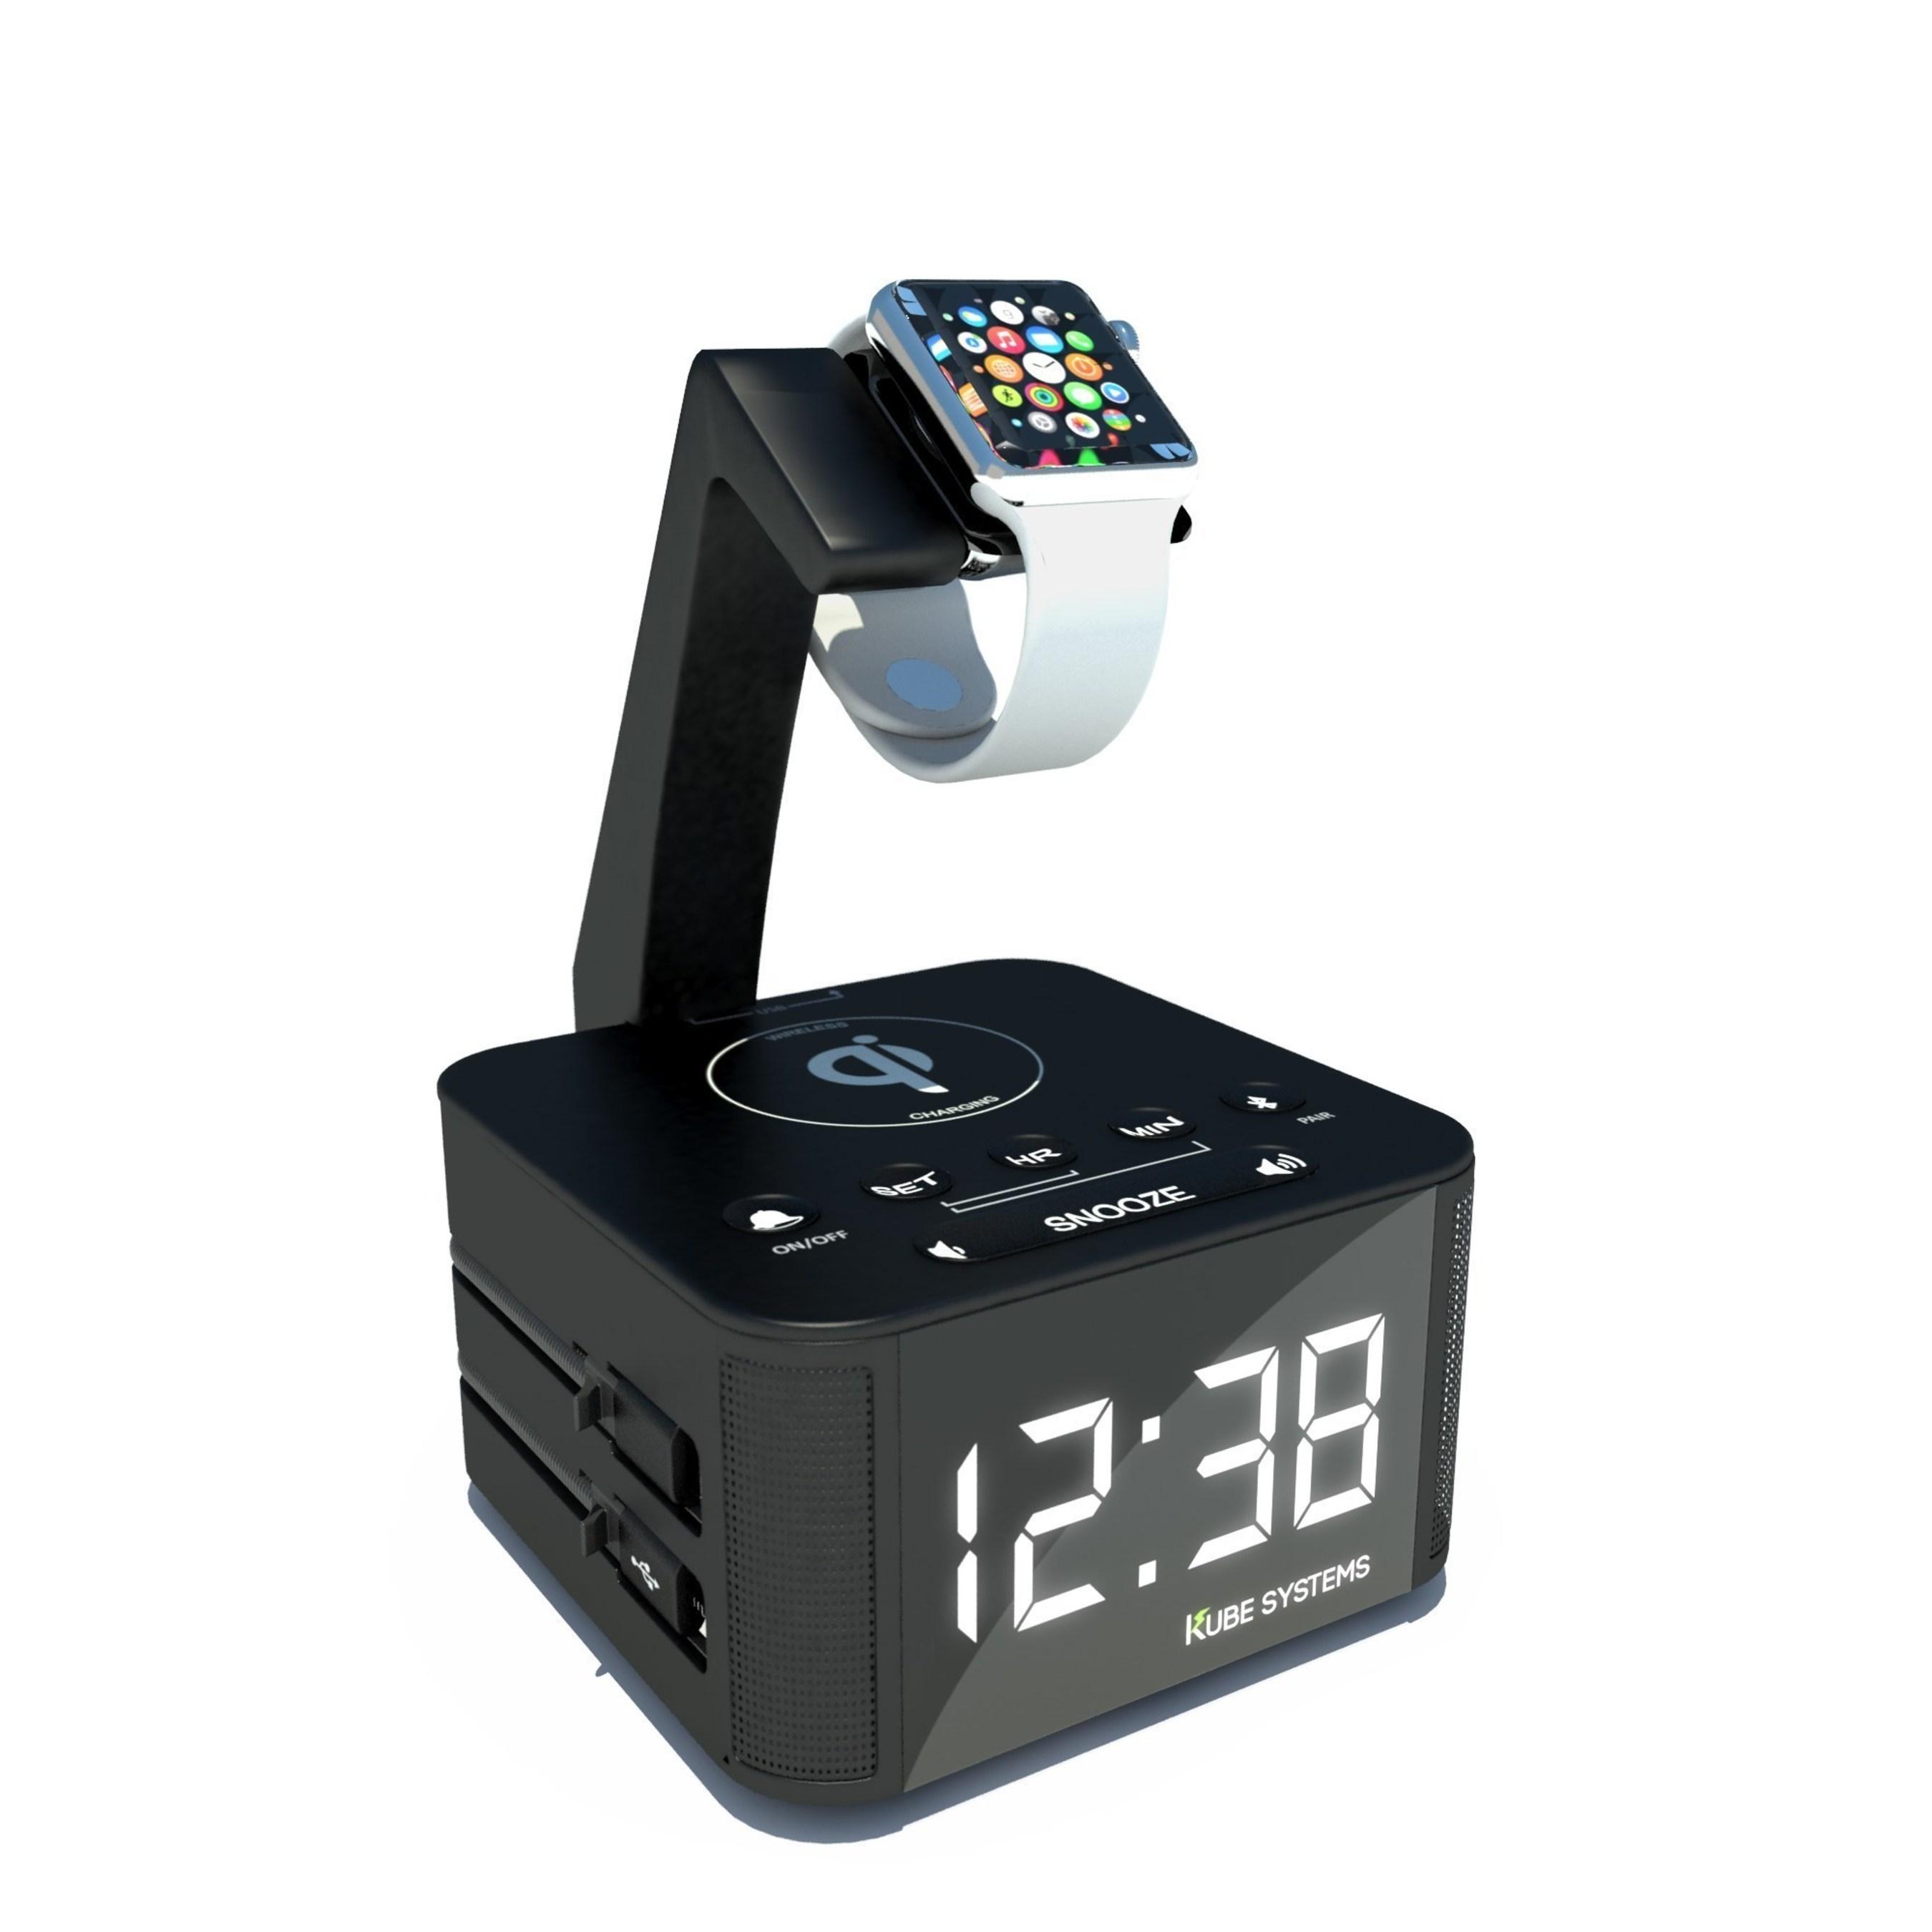 KS Clock(TM) with apple watch attachment